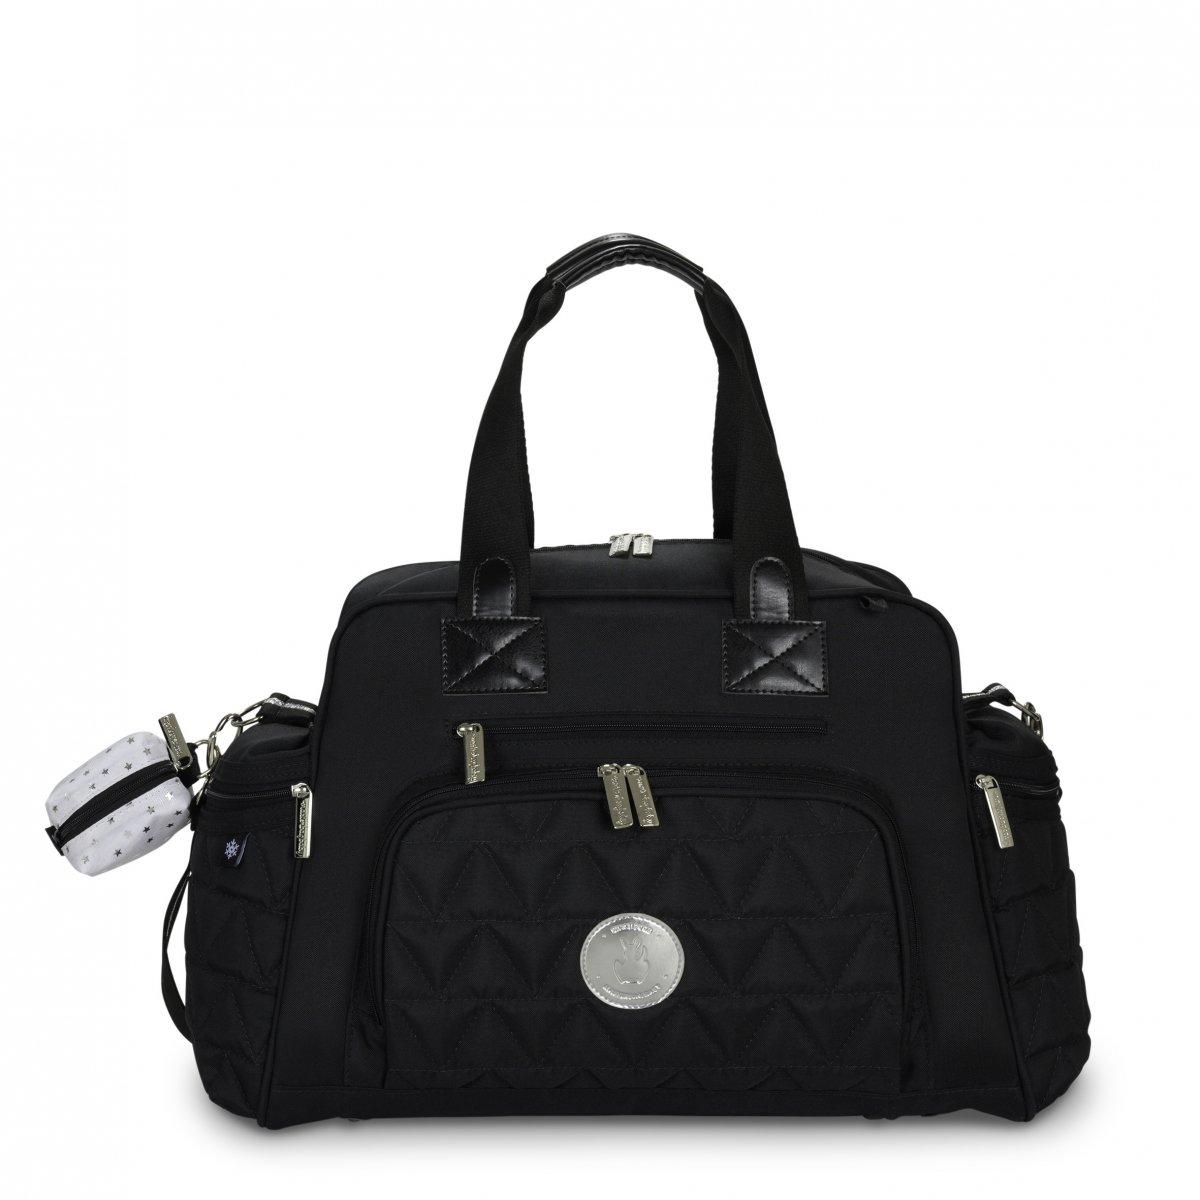 Bolsa Maternidade Everyday Nylon Masterbag | Cor: Preto